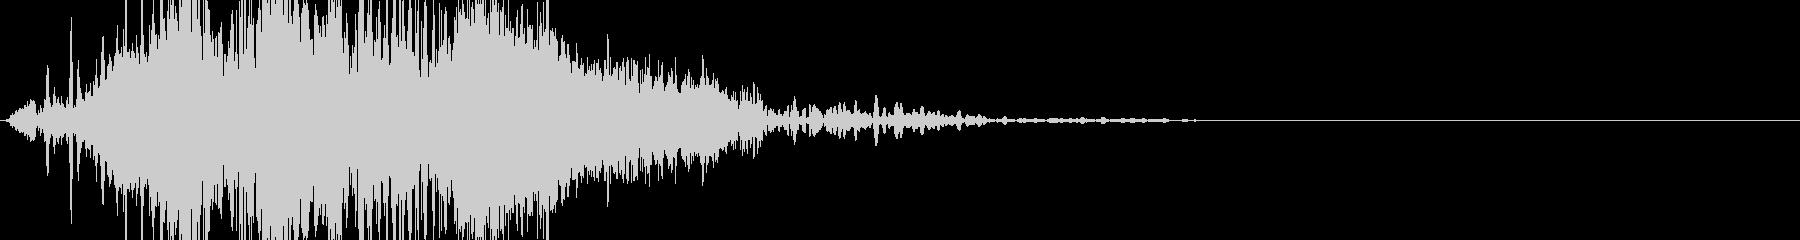 SciFi系 UIイメージ音です。の未再生の波形